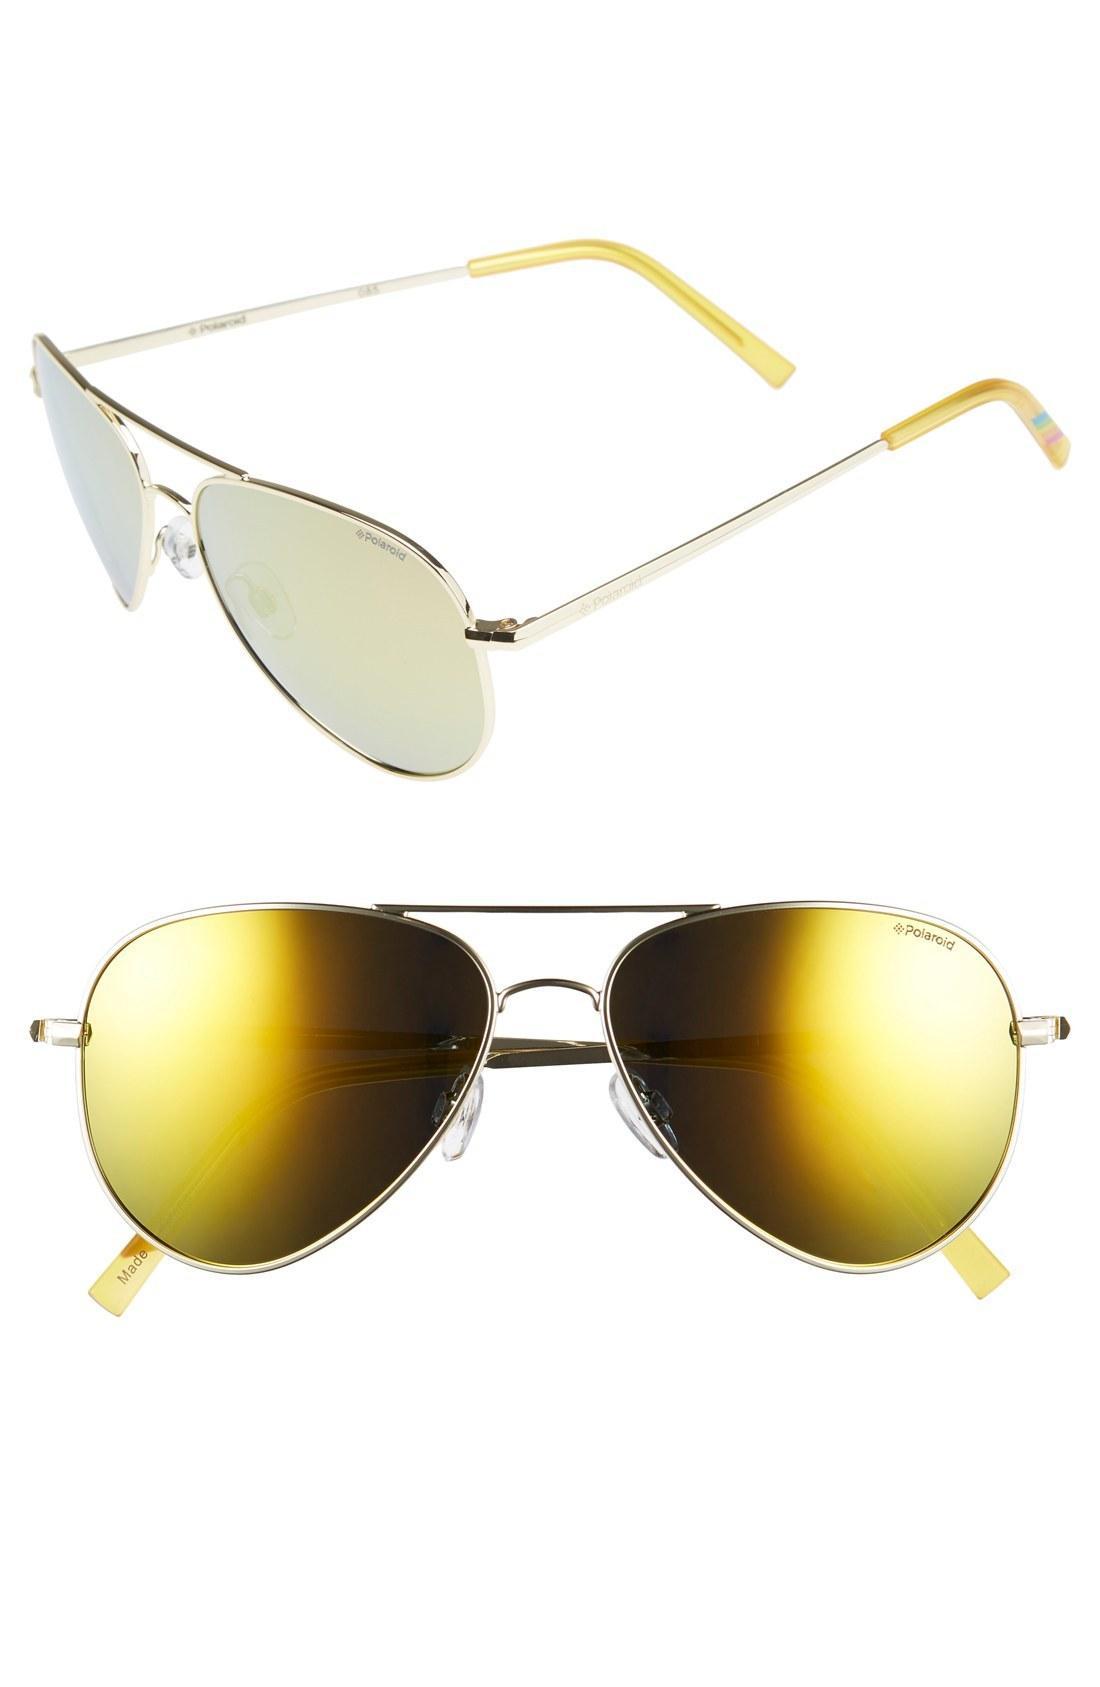 80a75b1ef6474 Polaroid 56Mm Polarized Aviator Sunglasses - Gold  Gold Mirror  Polarized